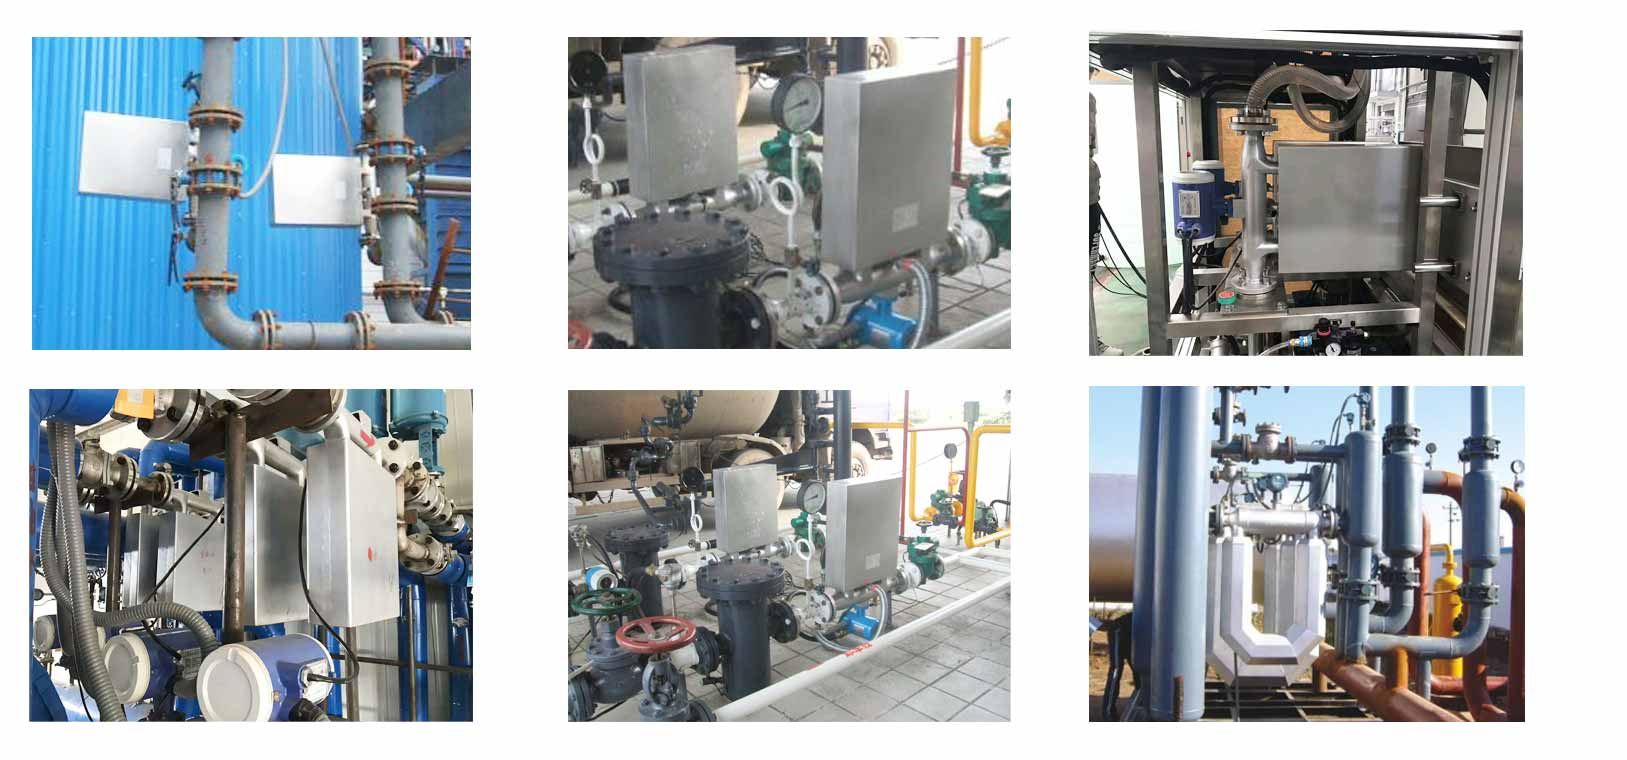 Installaion-coriolis-mass-flowmeter